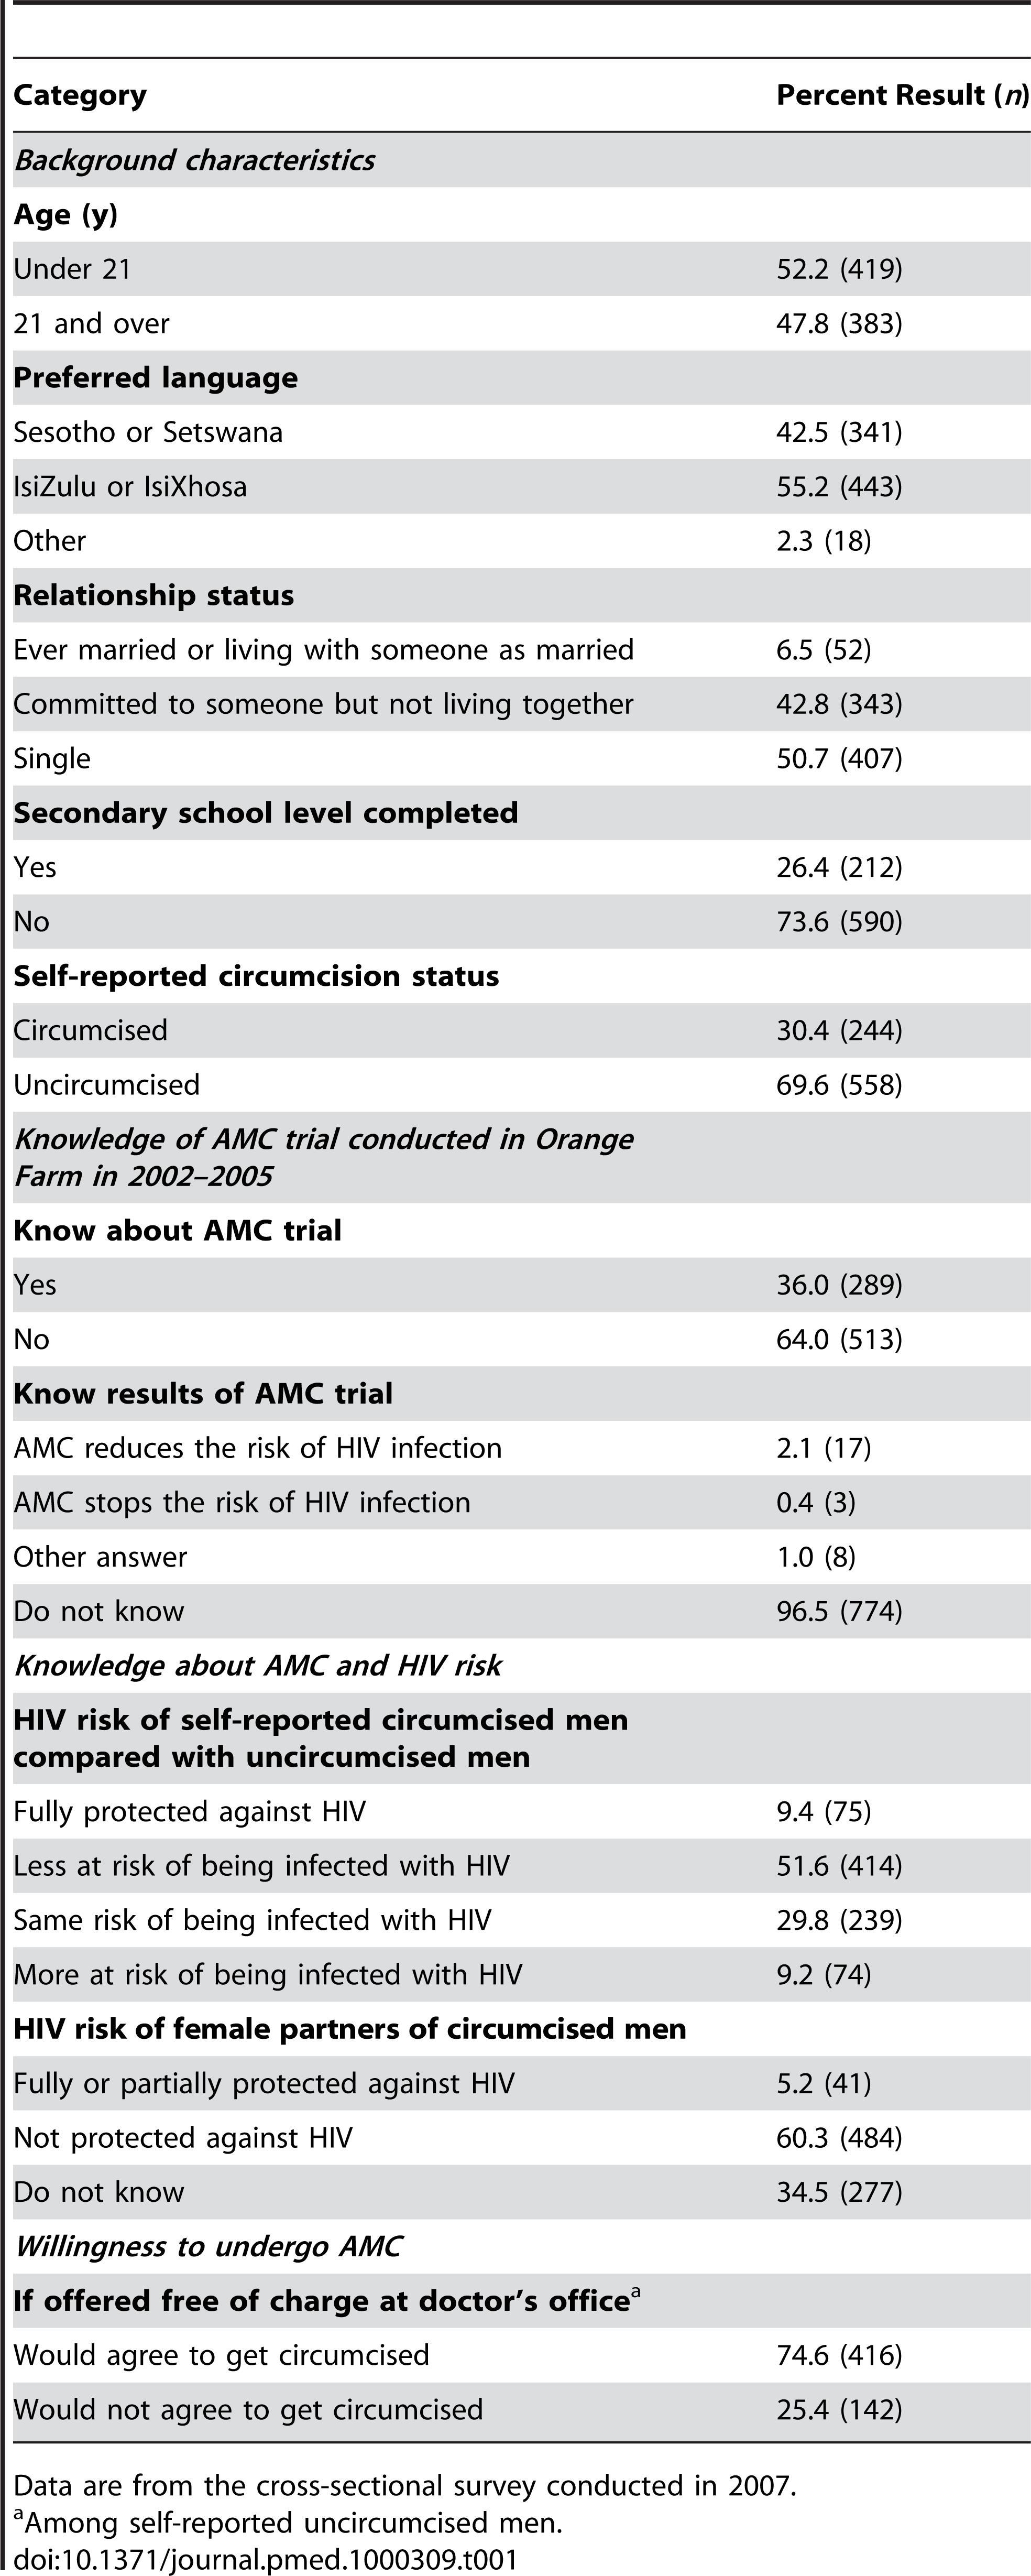 AMC knowledge and willingness to undergo AMC among a representative sample of Orange Farm male residents (<i>n</i>=802).